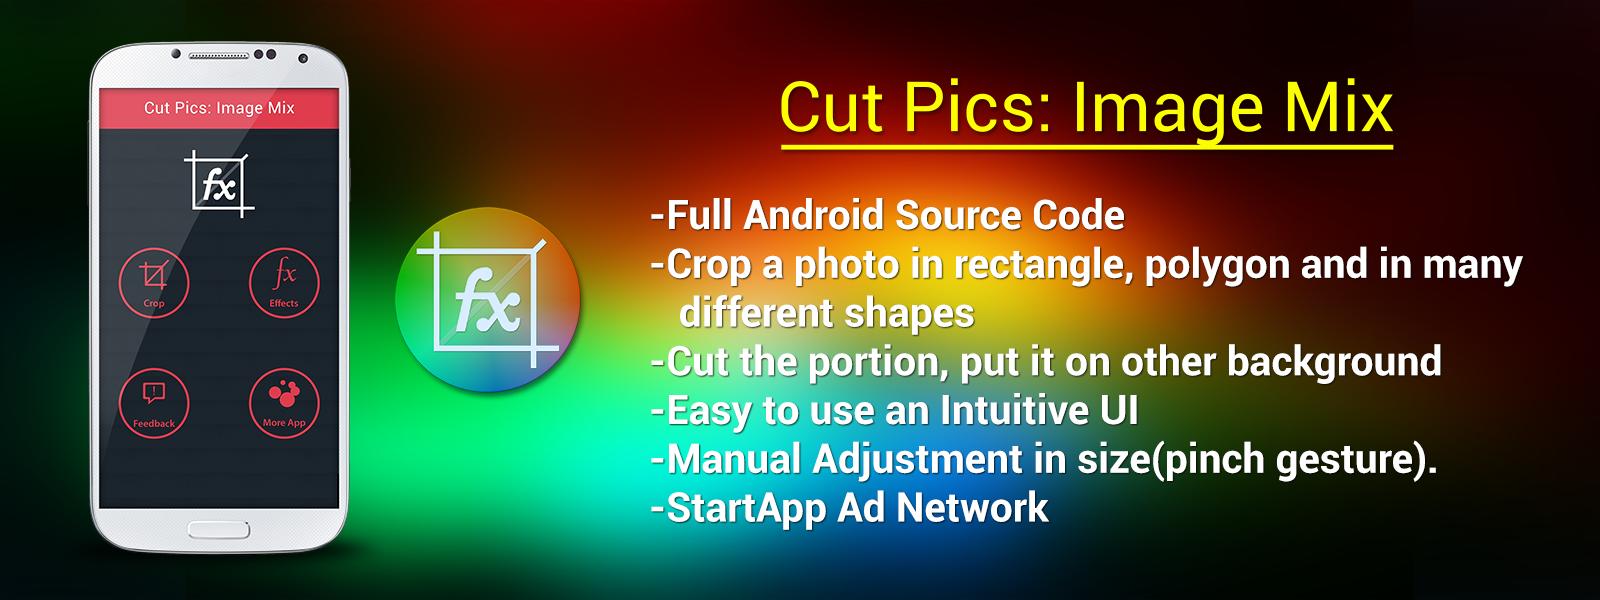 Buy Cut Pics : Image Mix app source code - Sell My App